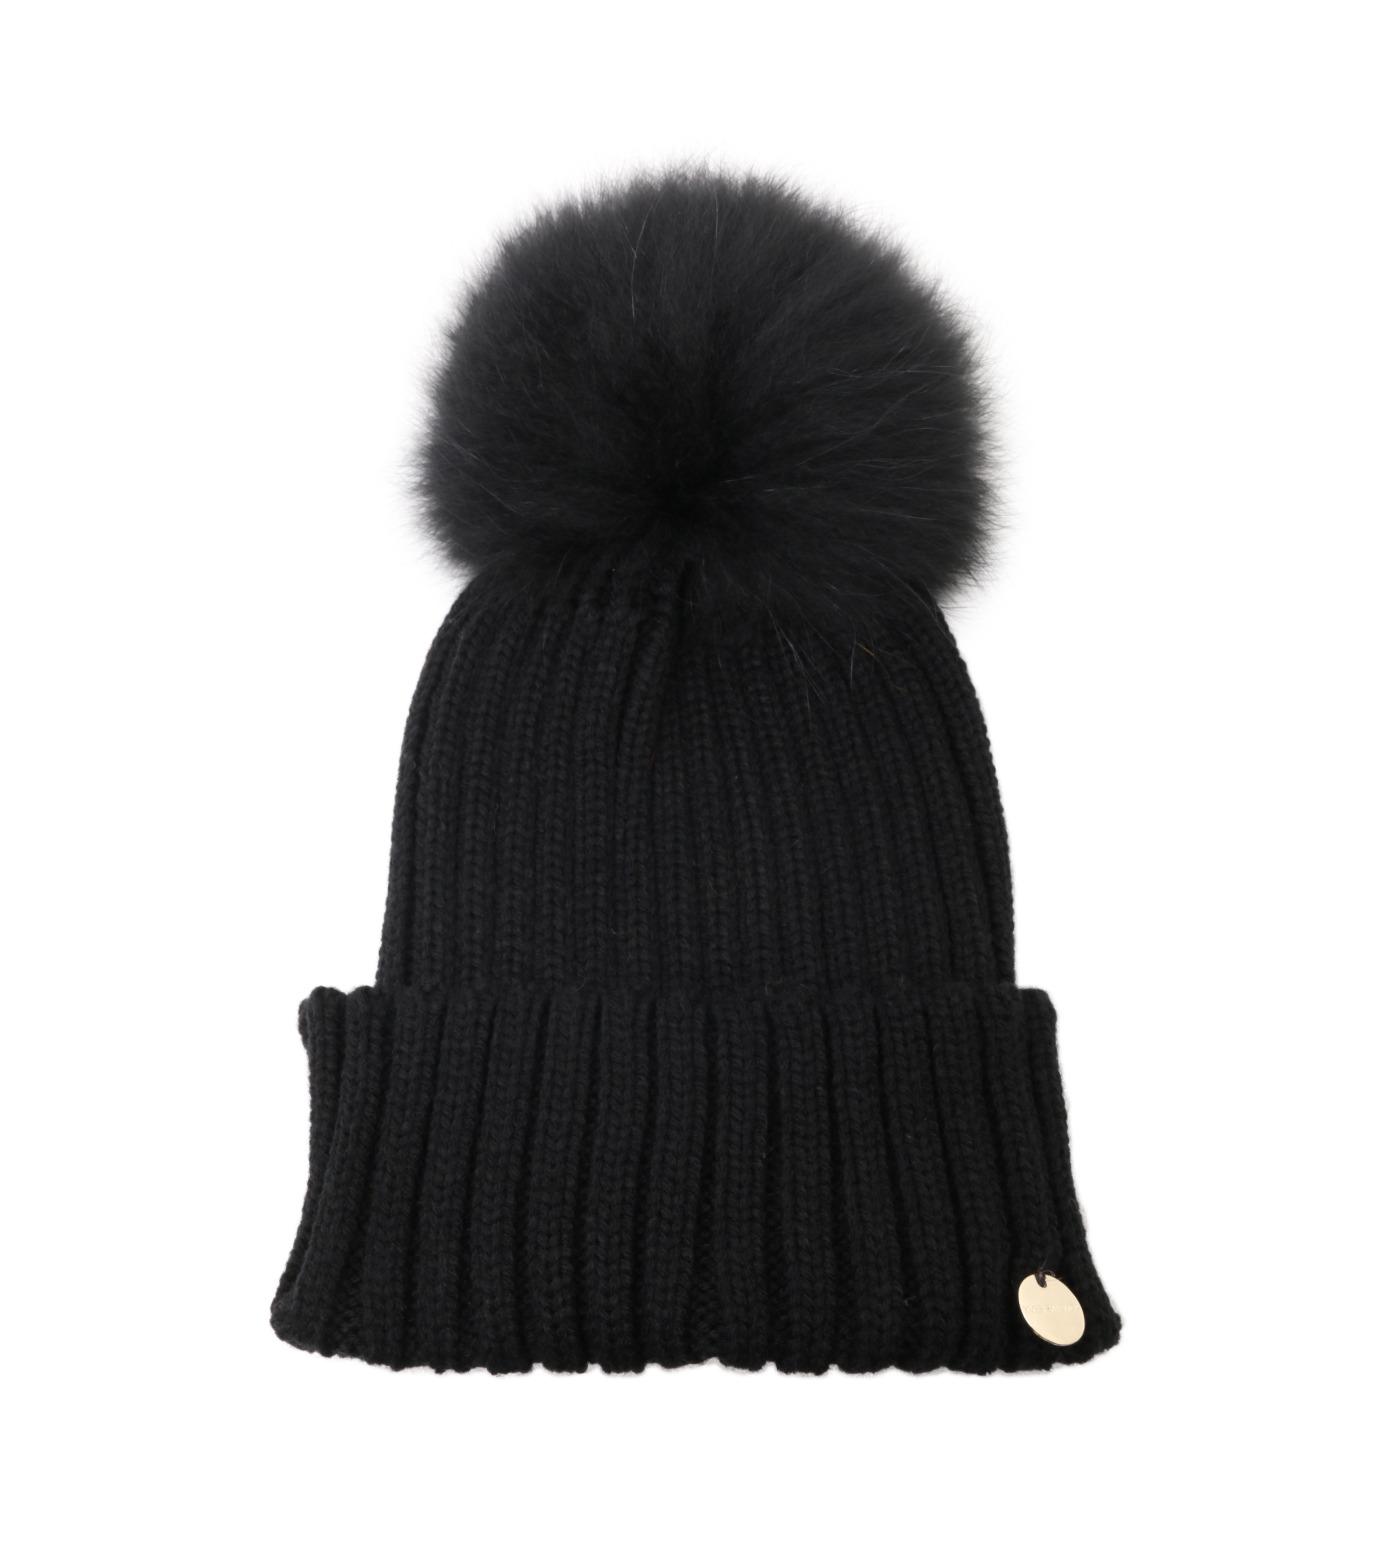 Yves Salomon(イヴ サロモン)のKnit Cap w/Marmotte Fur-BLACK(キャップ/cap)-Y5982XXFCA-13 拡大詳細画像1